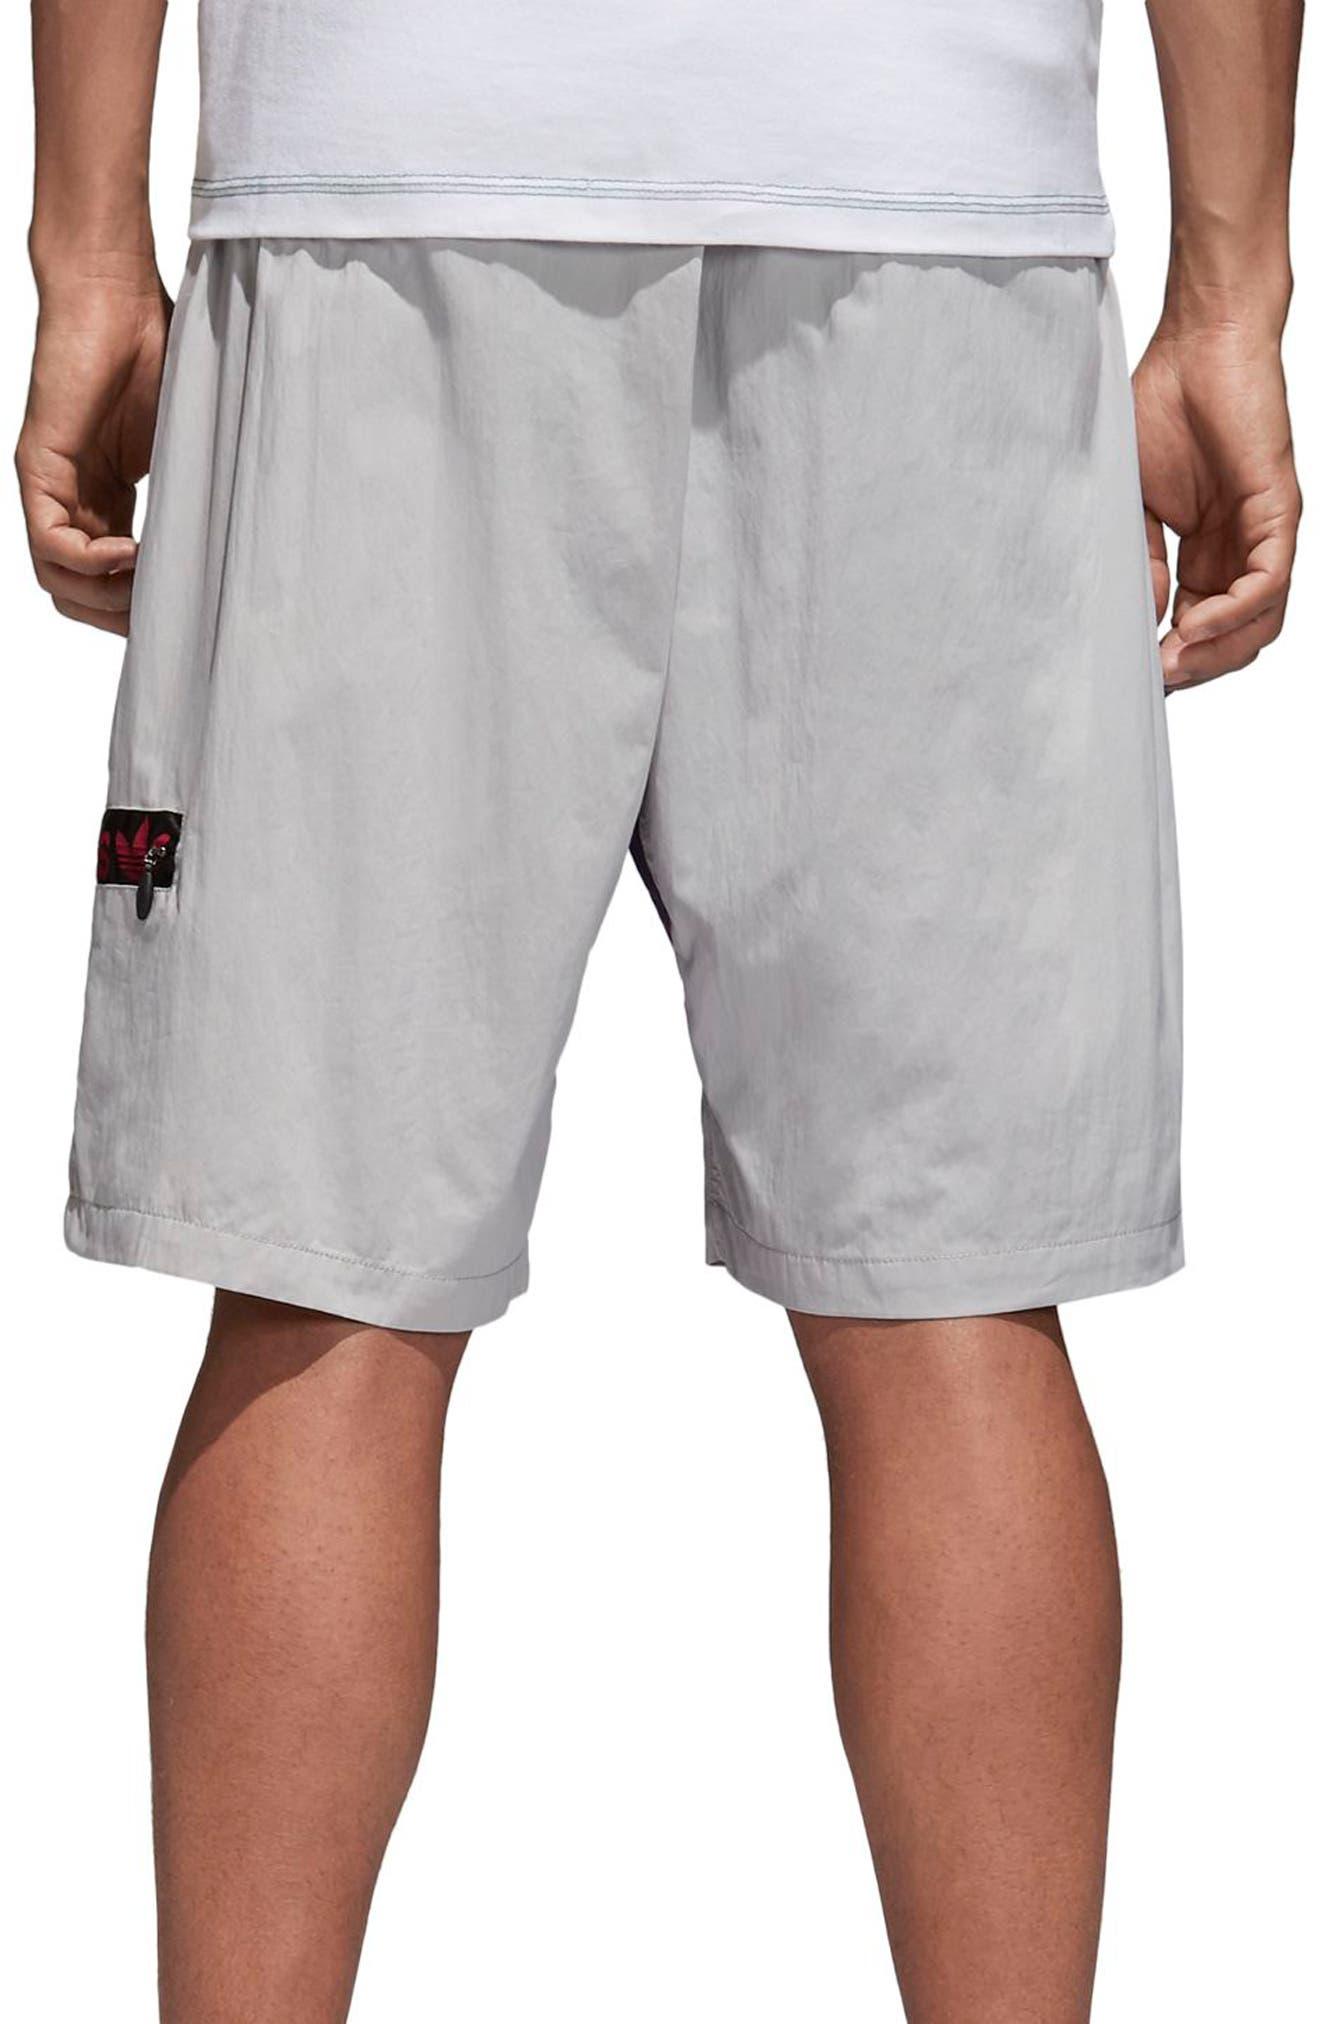 ADIDAS ORIGINALS,                             Atric Shorts,                             Alternate thumbnail 2, color,                             033